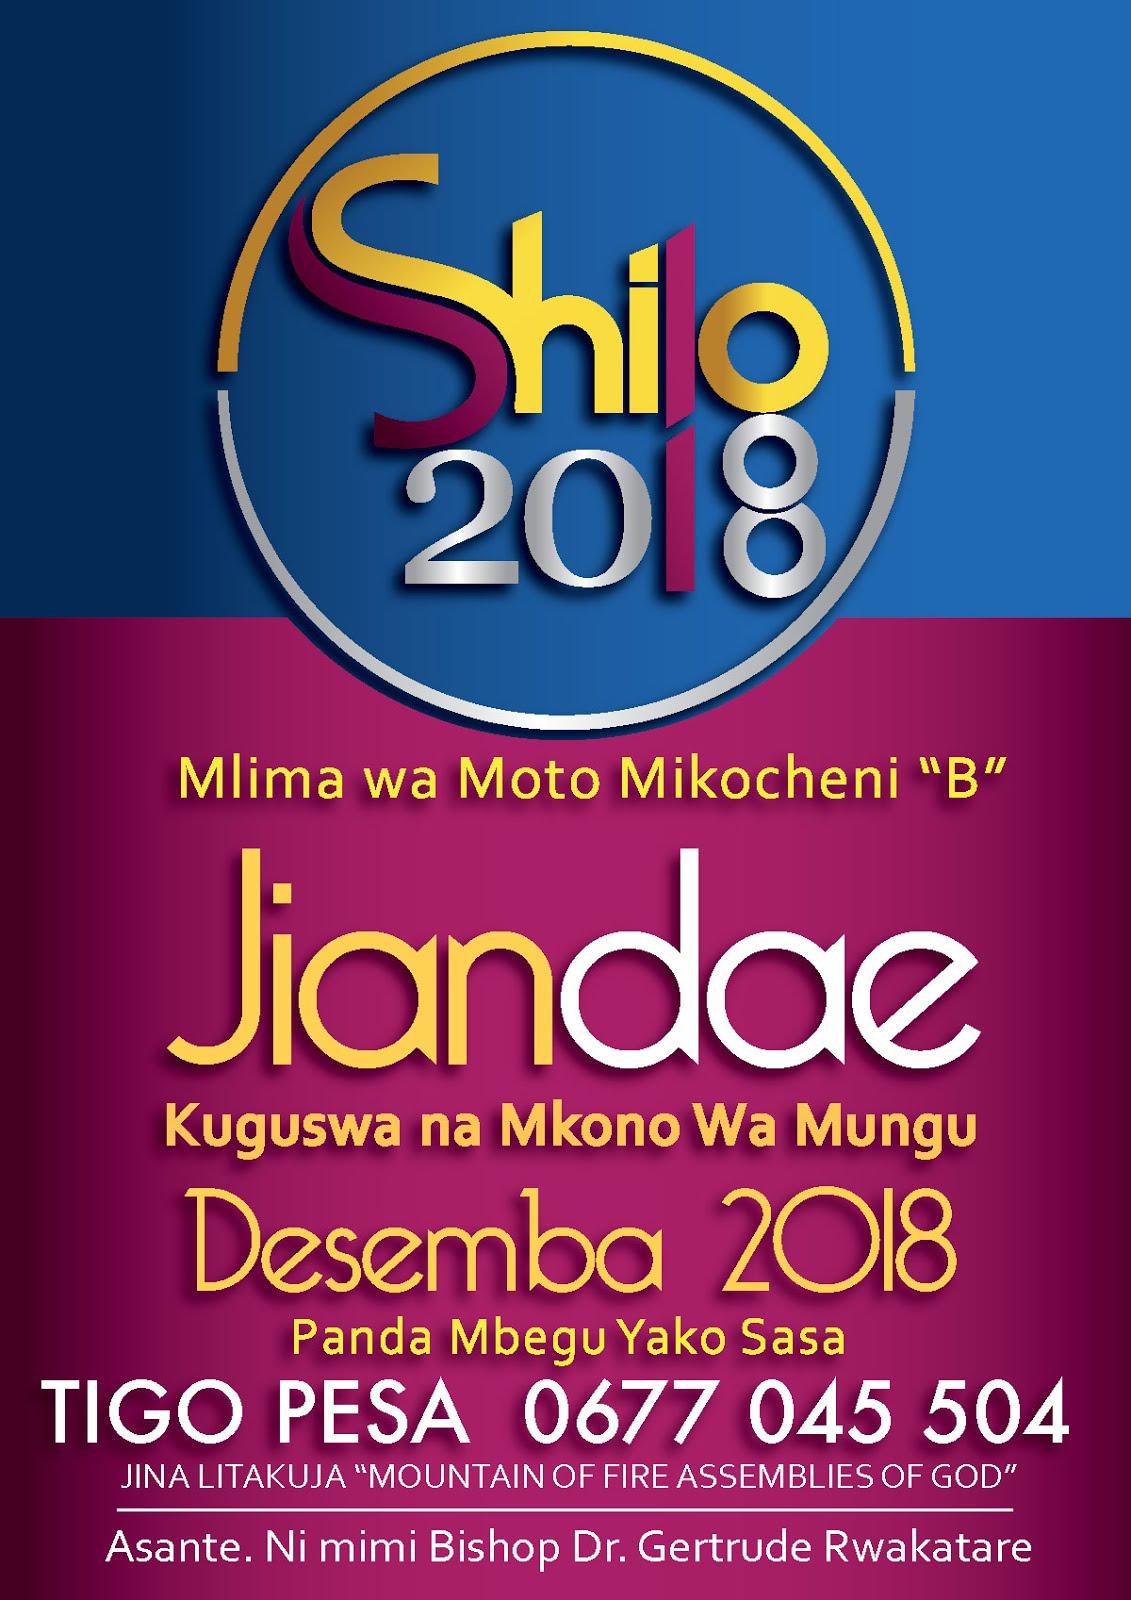 SHILO 2018-CHANGIA